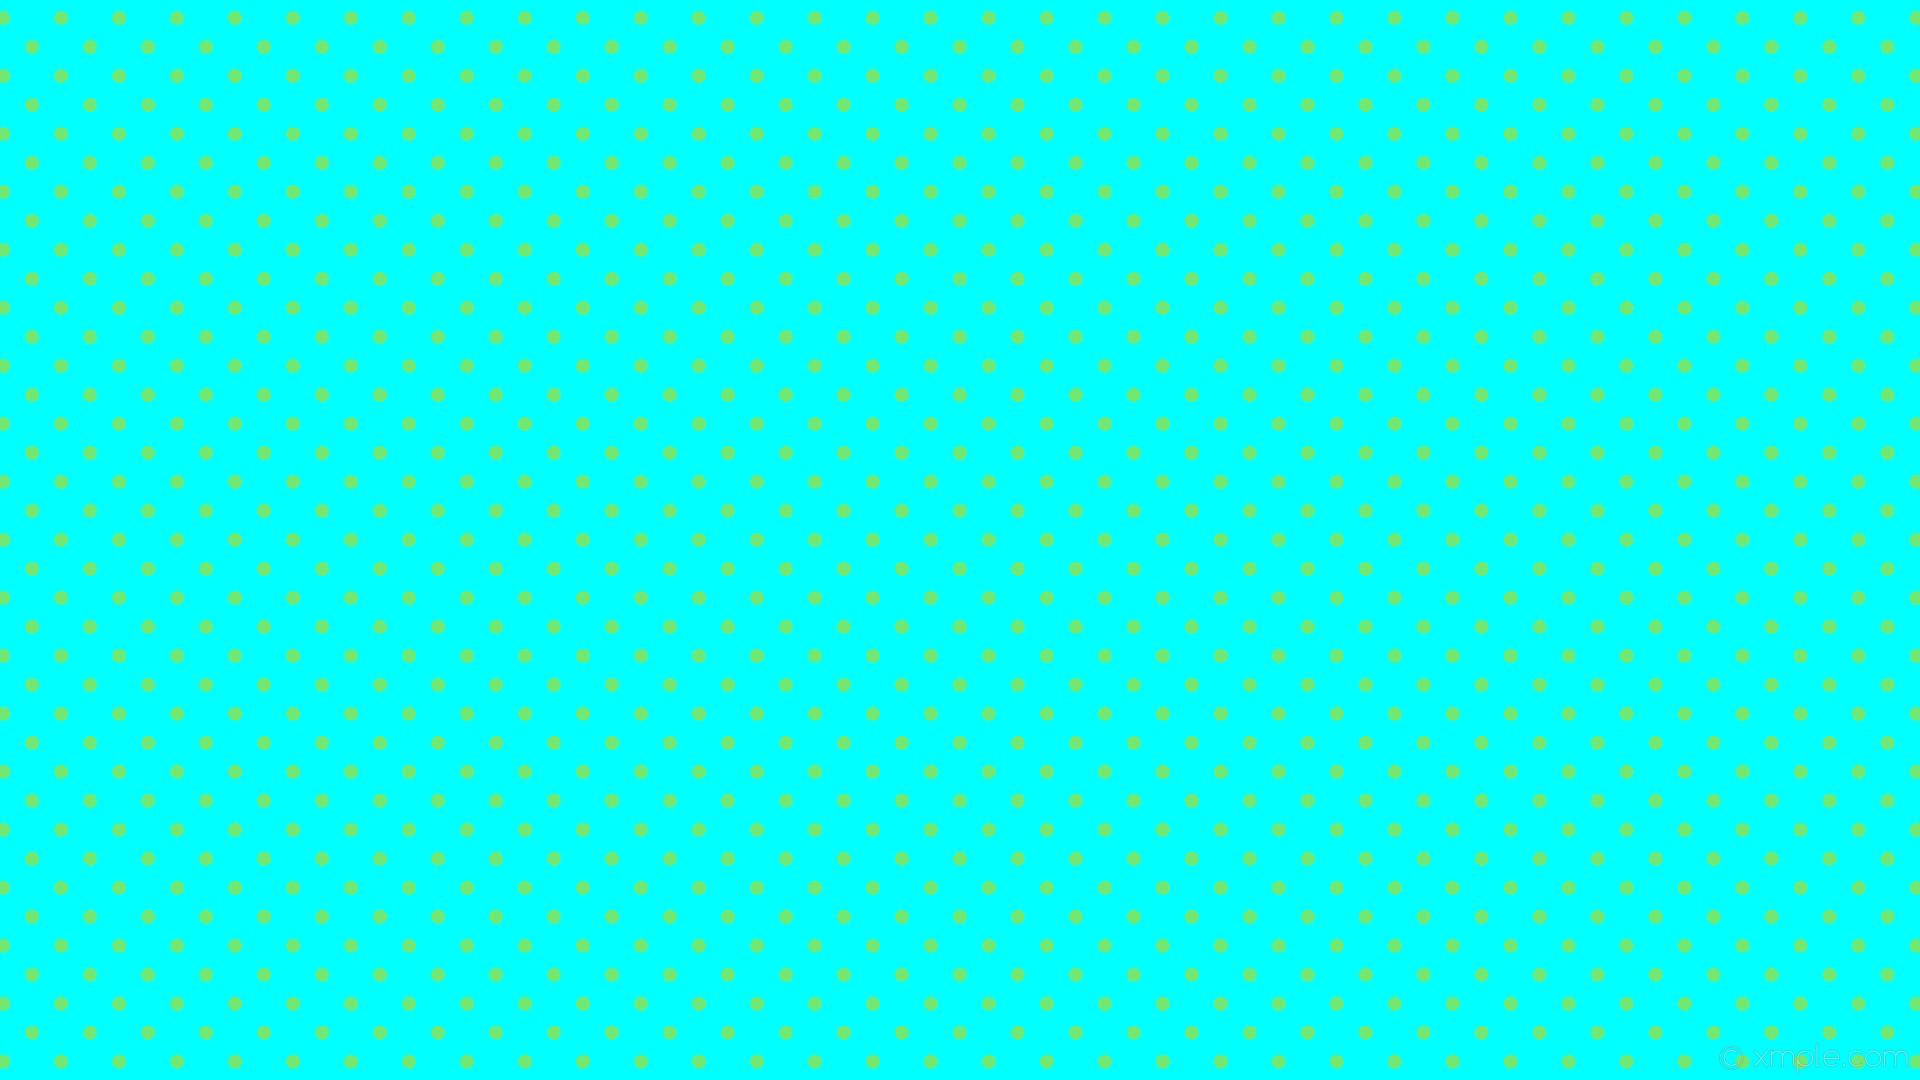 wallpaper dots blue green polka spots aqua cyan #00ffff #72e874 225° 14px  41px